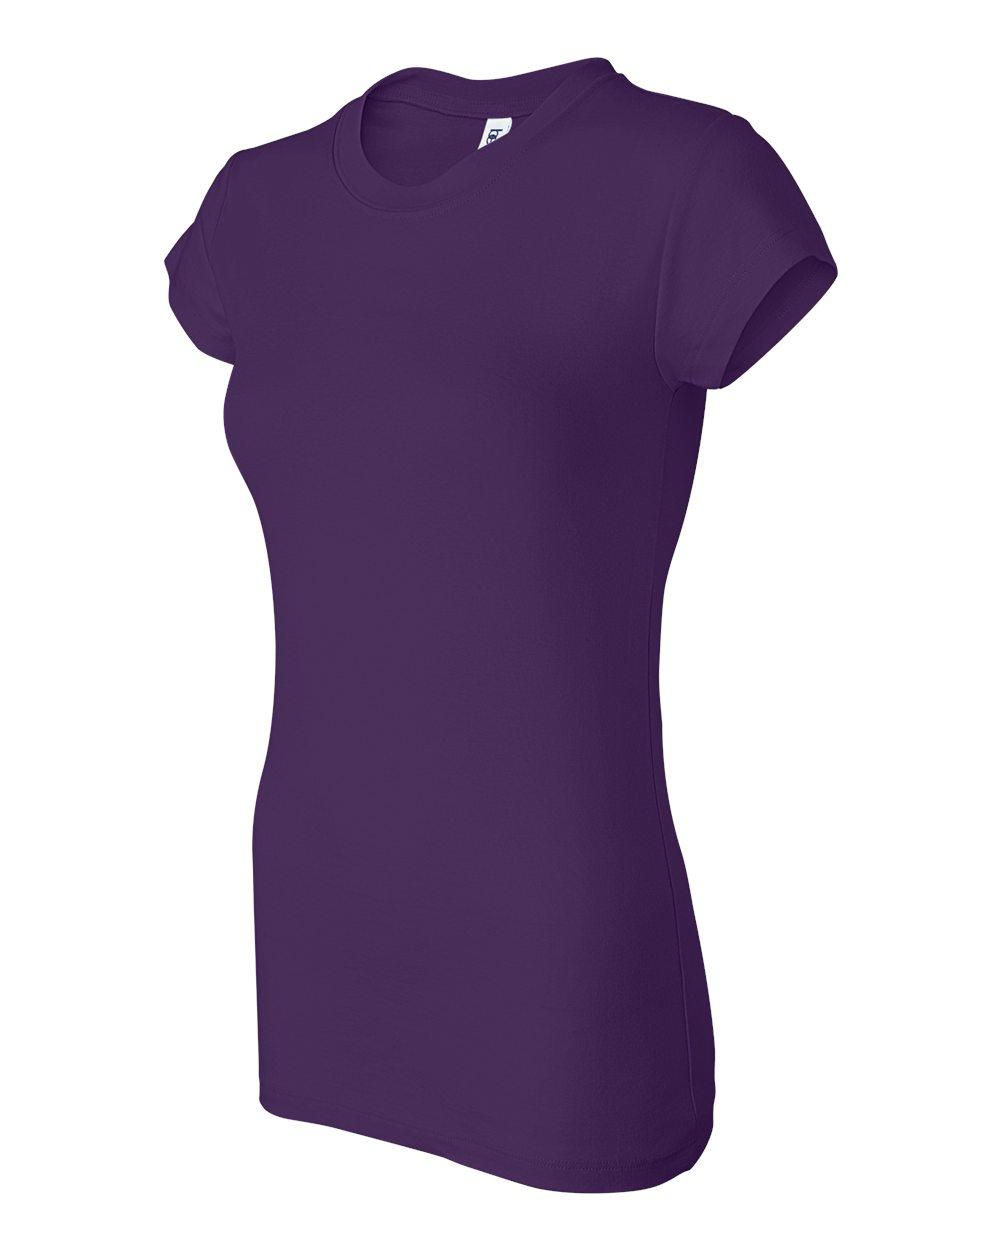 Bella-Canvas-Women-039-s-Sheer-Mini-Rib-Short-Sleeve-T-Shirt-8701-S-2XL thumbnail 30